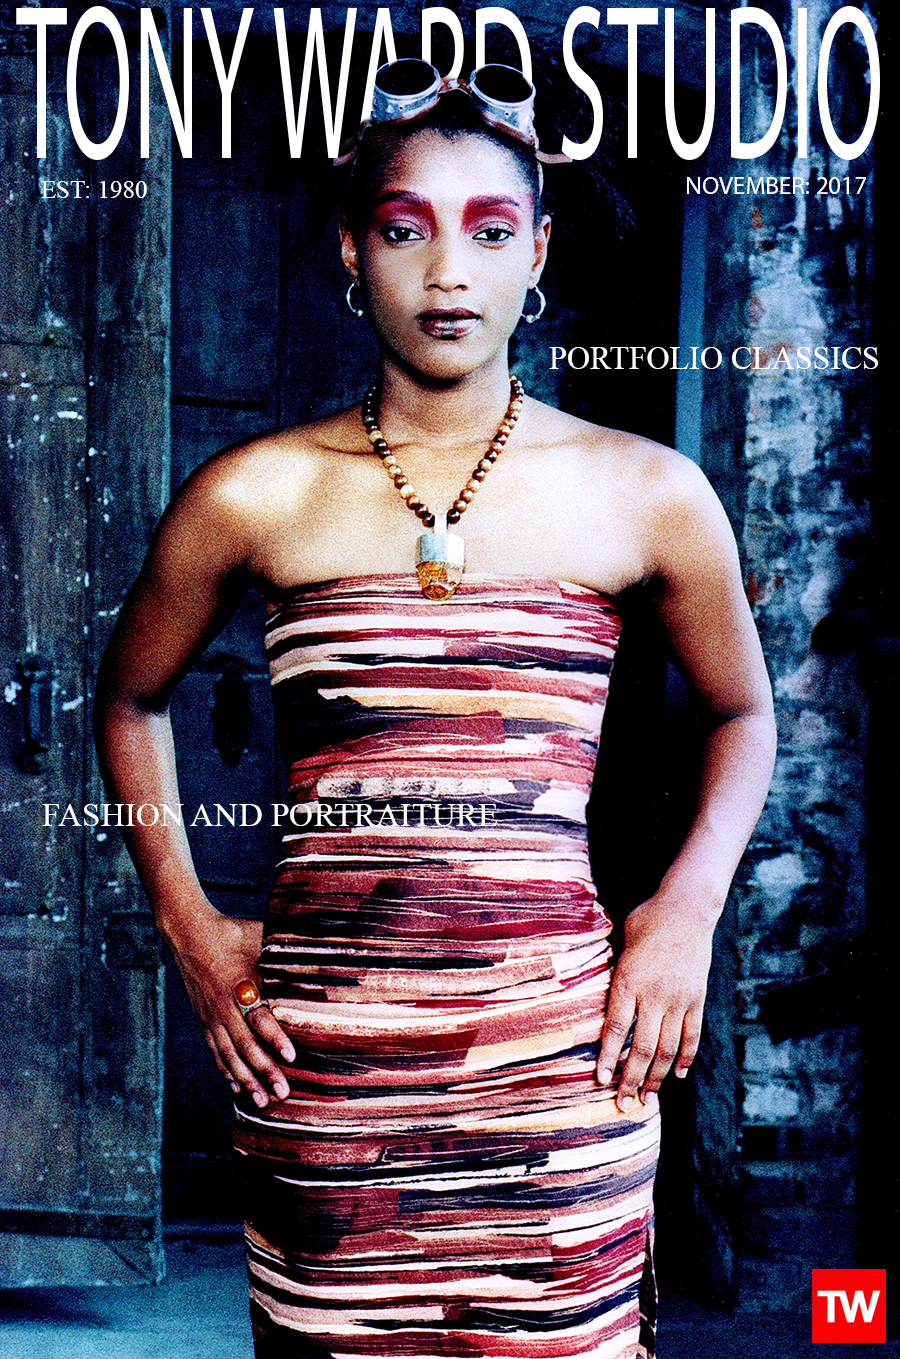 Tony_Ward_early_work_Portraiture_photography_singer_Res_Vibe_Magazine_1994